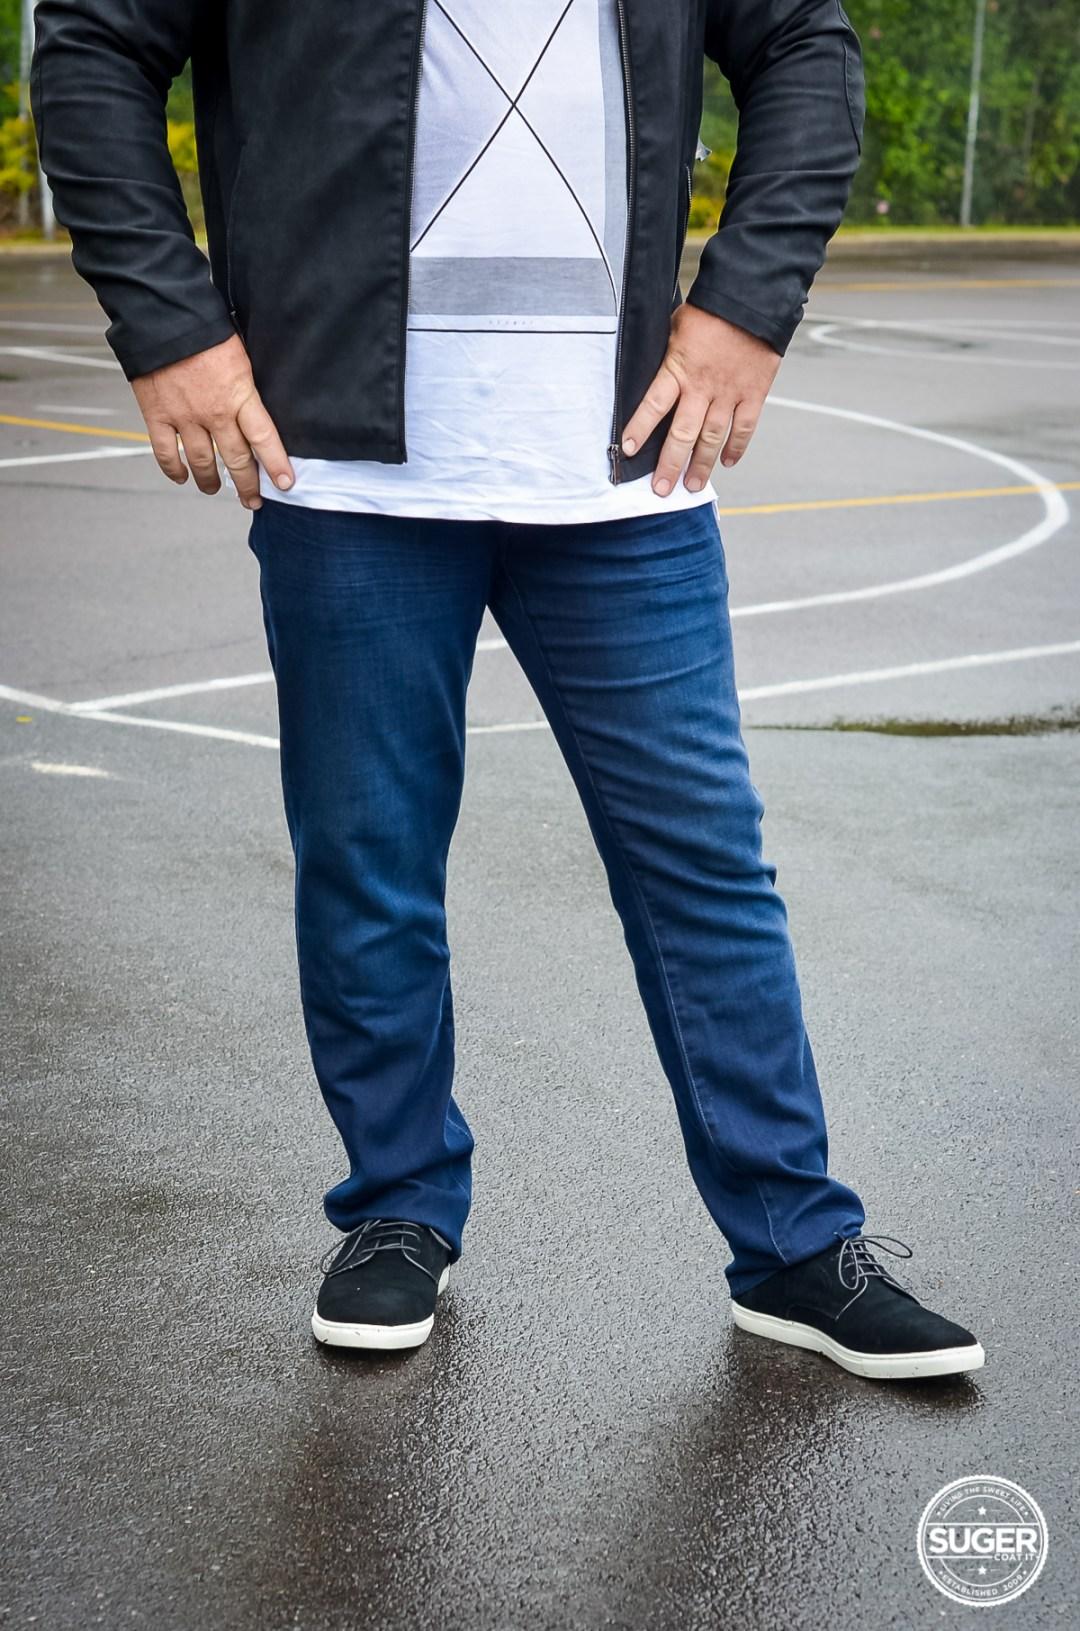 johnny bigg autumn winter 2016 blogger review suger coat it-5